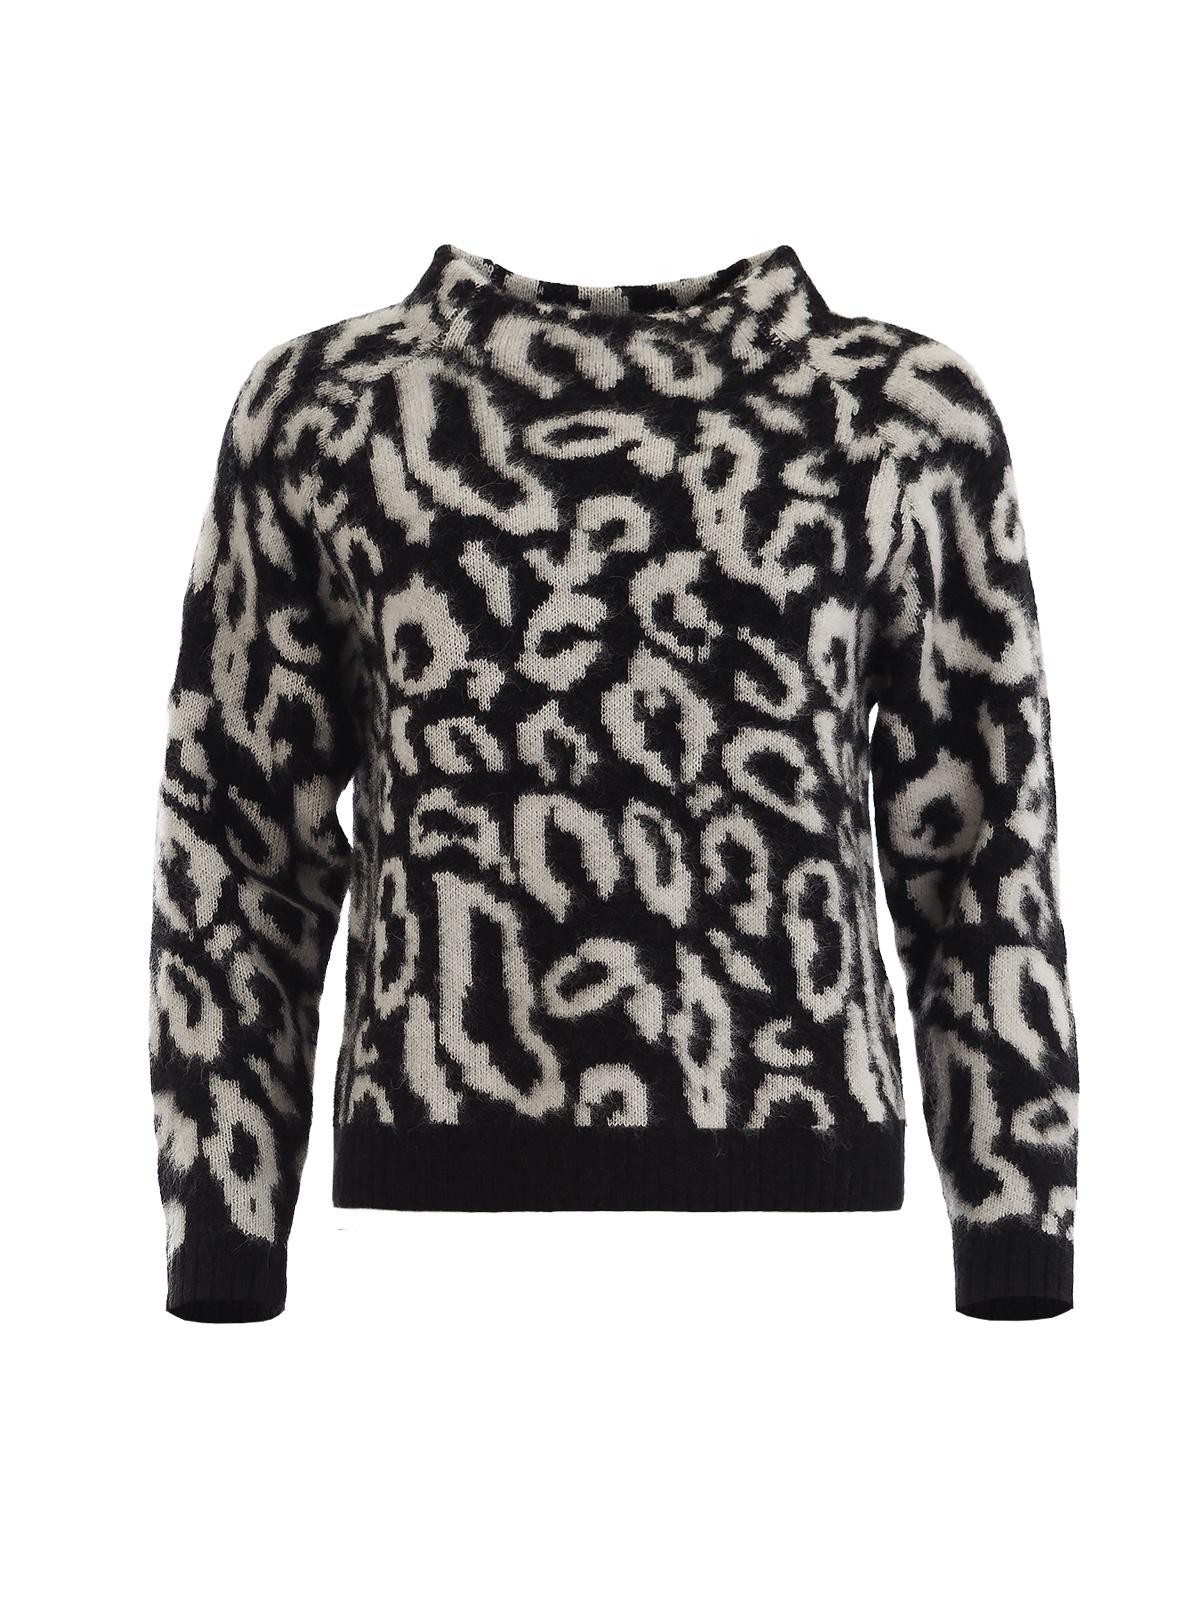 FENSIA BLACK KNITWEAR SWEATER | Shop for Fashion Trends in Knitwear, Jumpers & Cardigans - GIRISSIMA.COM